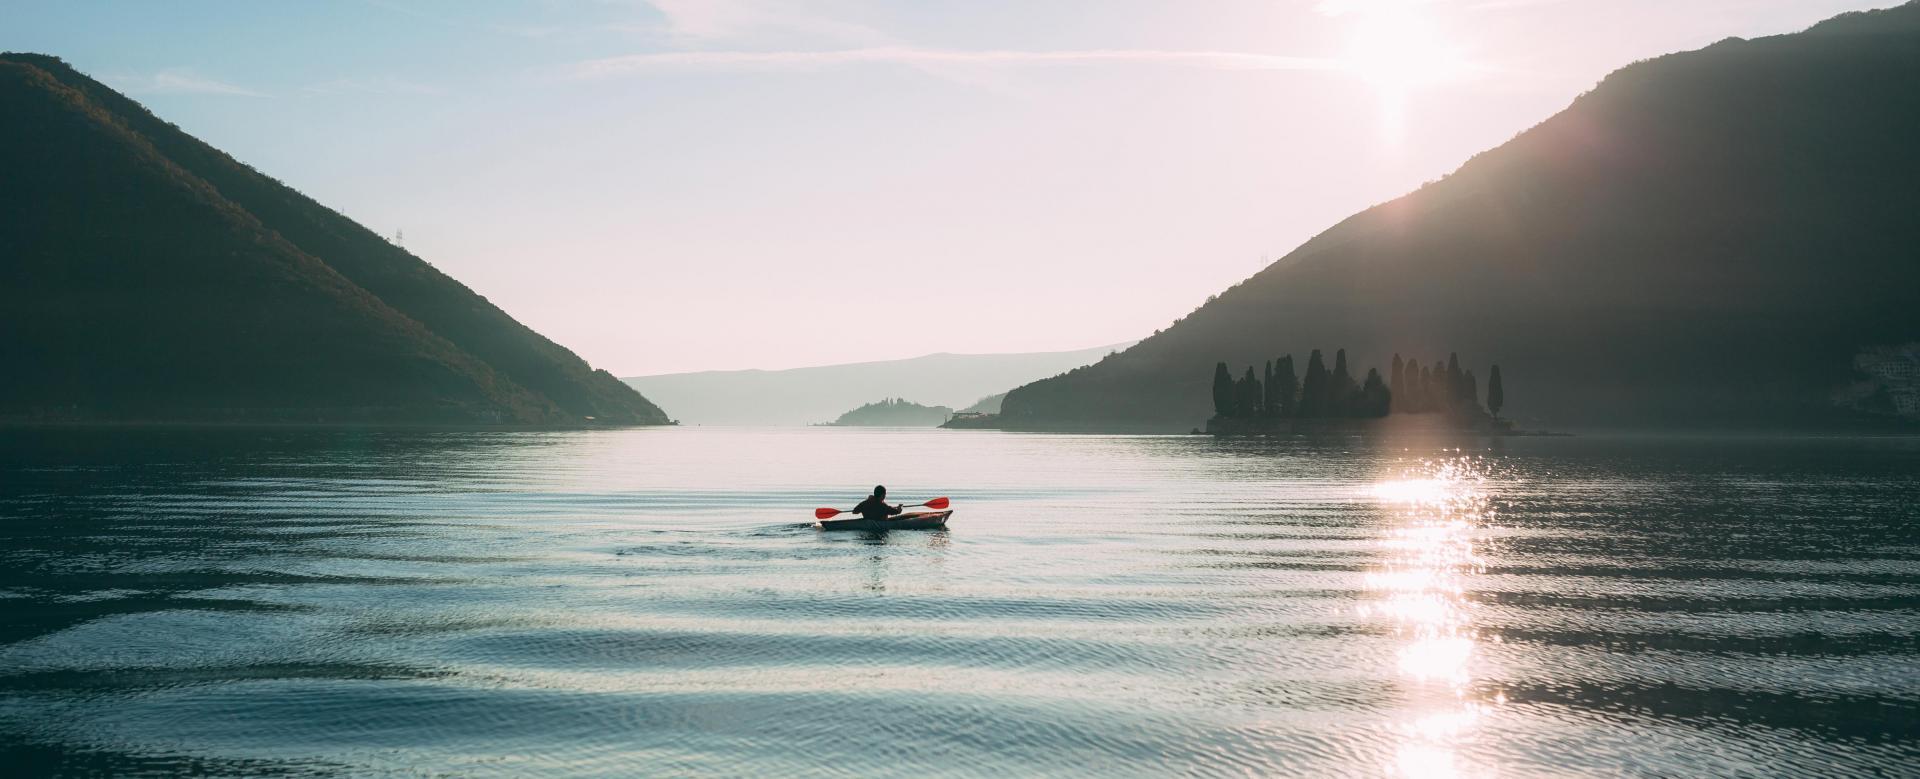 Voyage sur l'eau Canada : Rando-kayak en baie georgienne